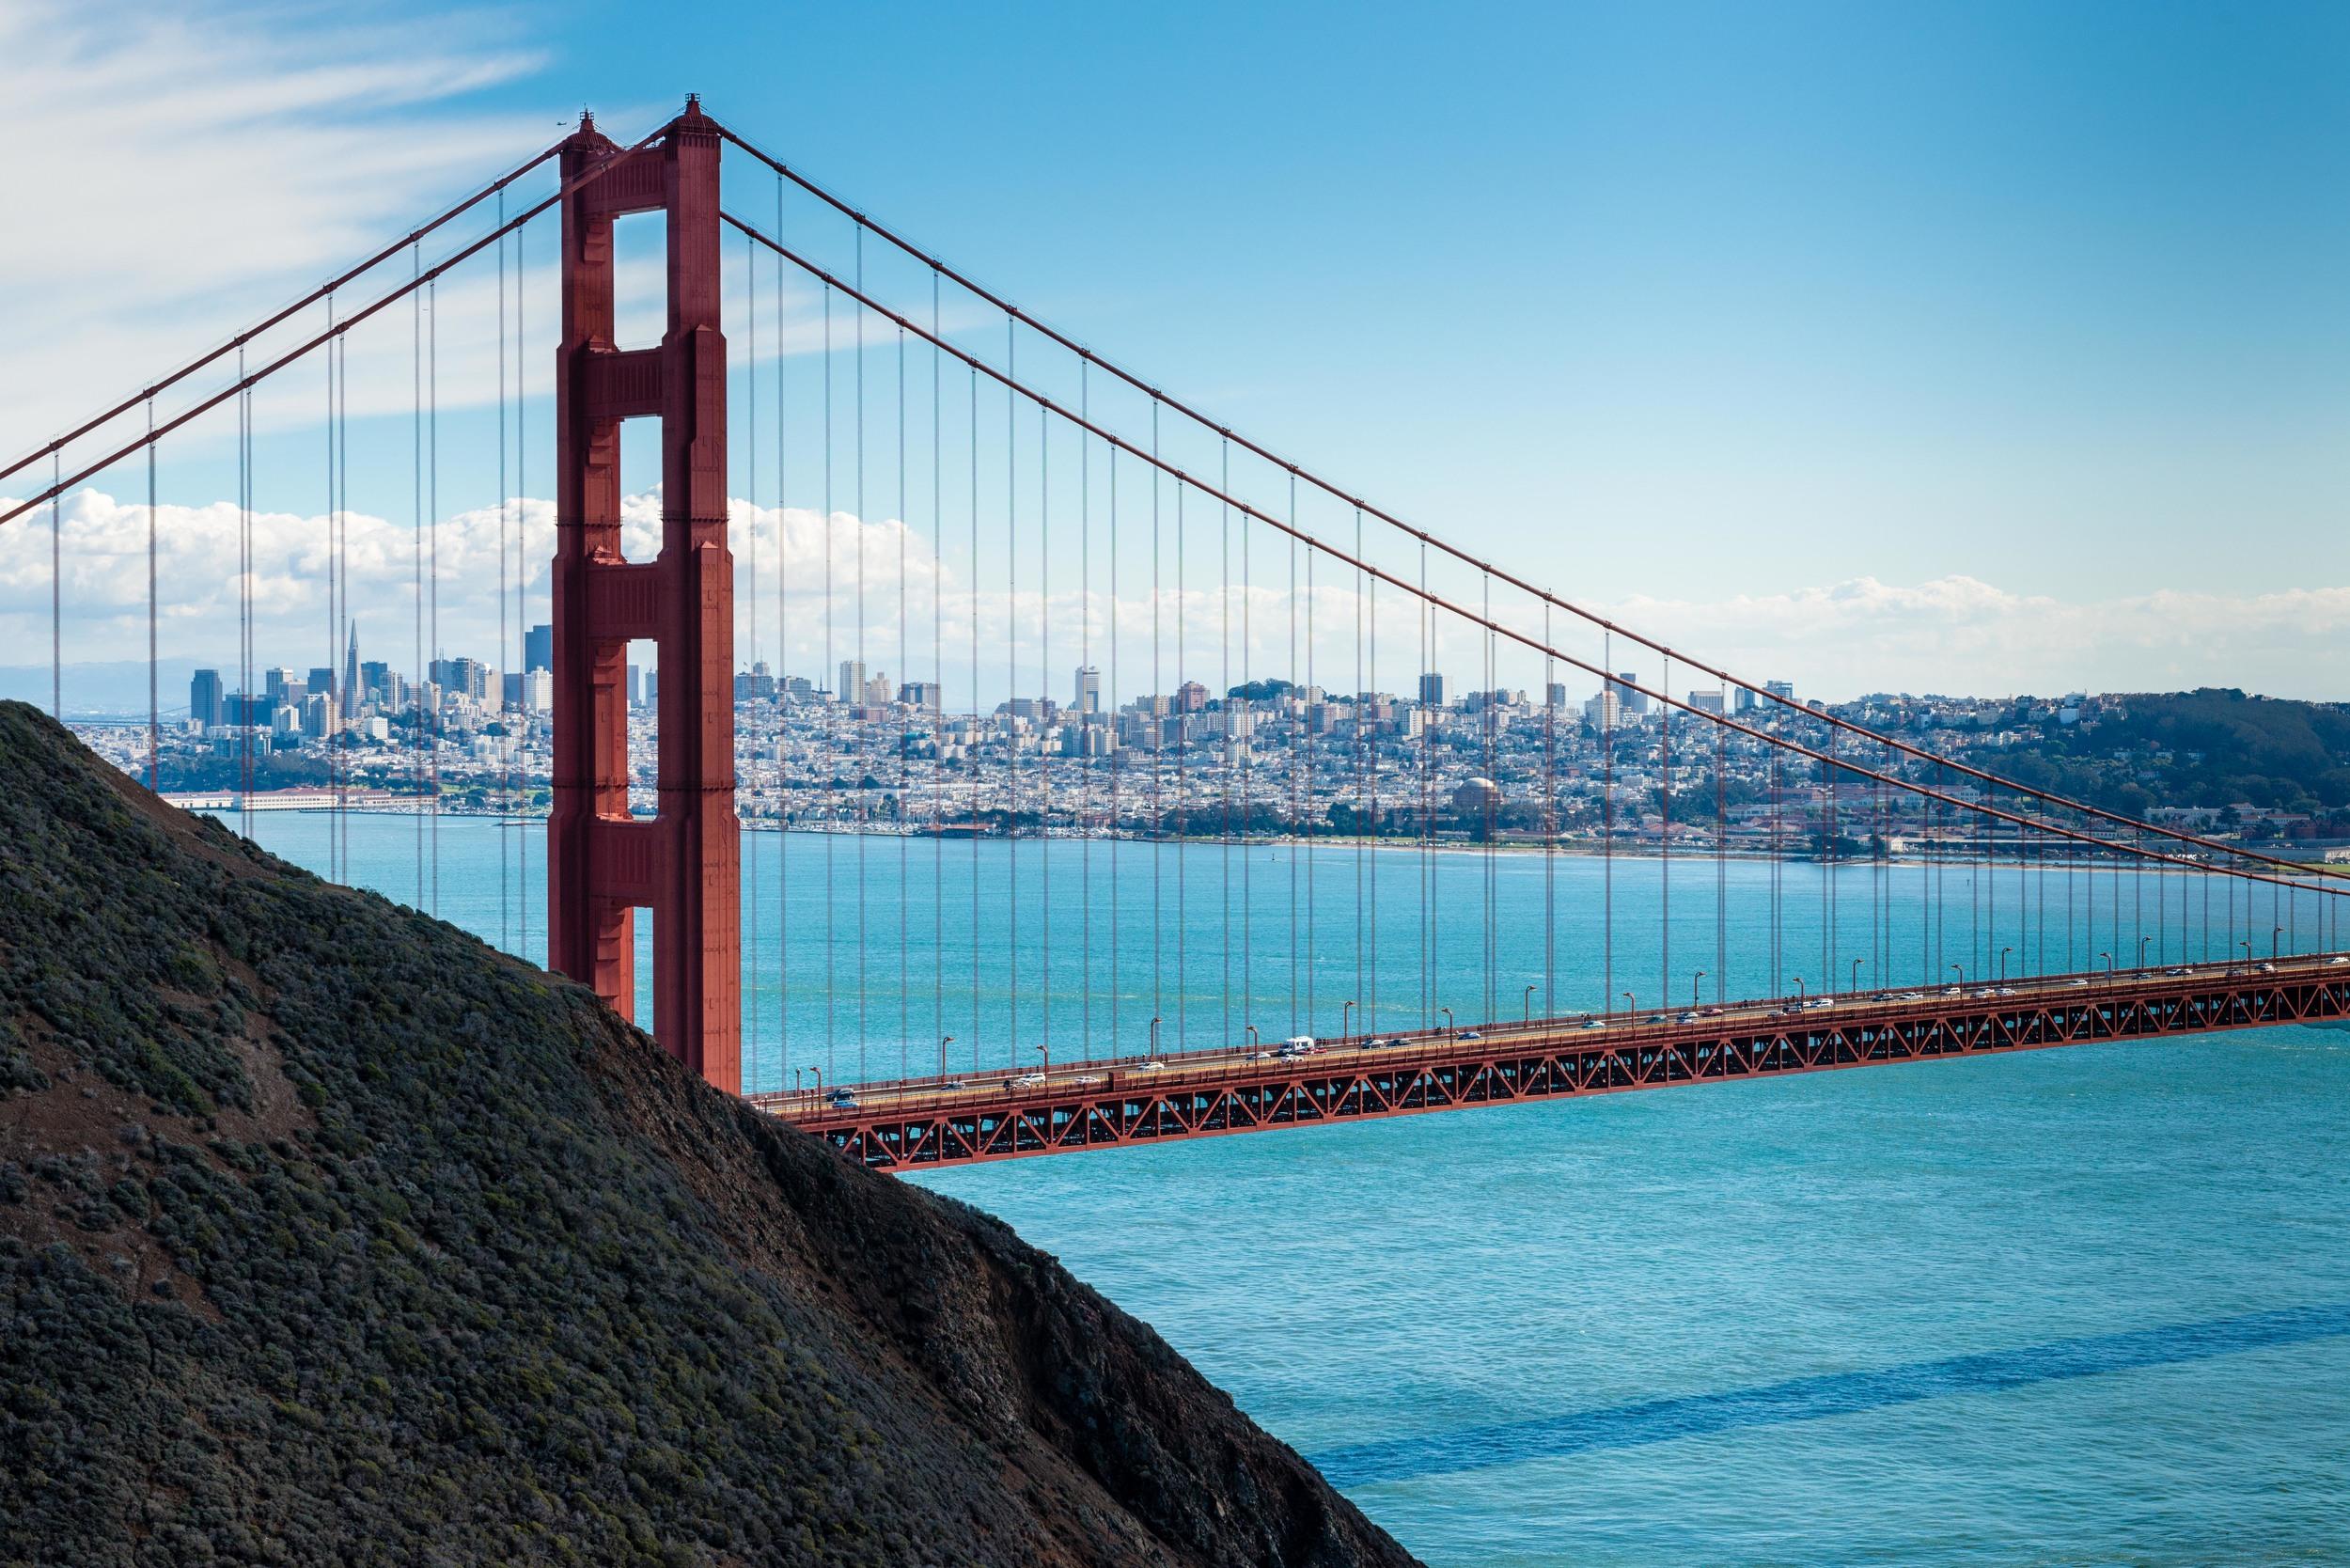 View of downtown San Francisco through the Golden Gate Bride